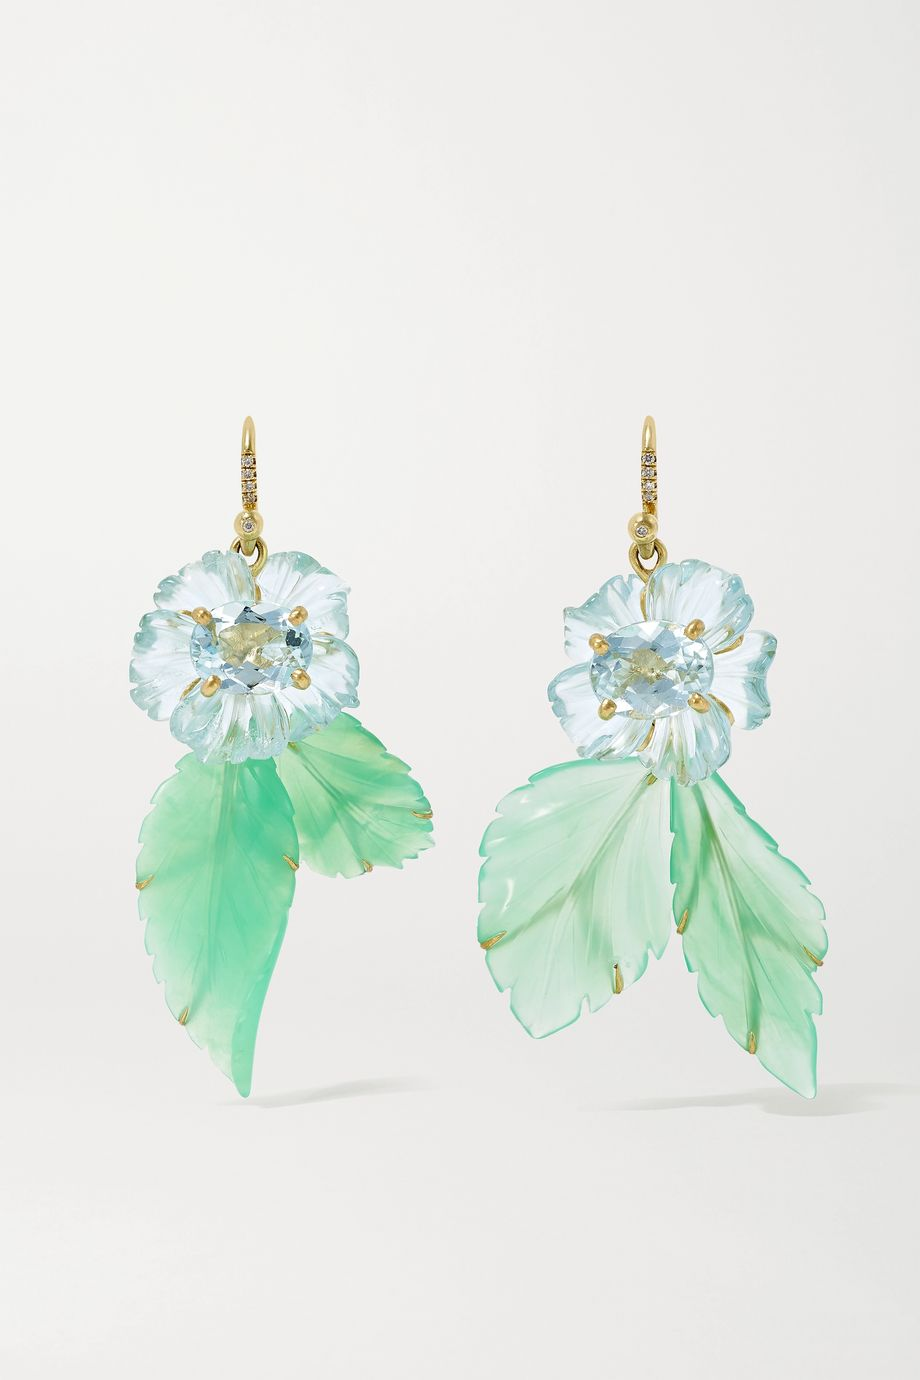 Irene Neuwirth Tropical Flower 18-karat gold multi-stone earrings